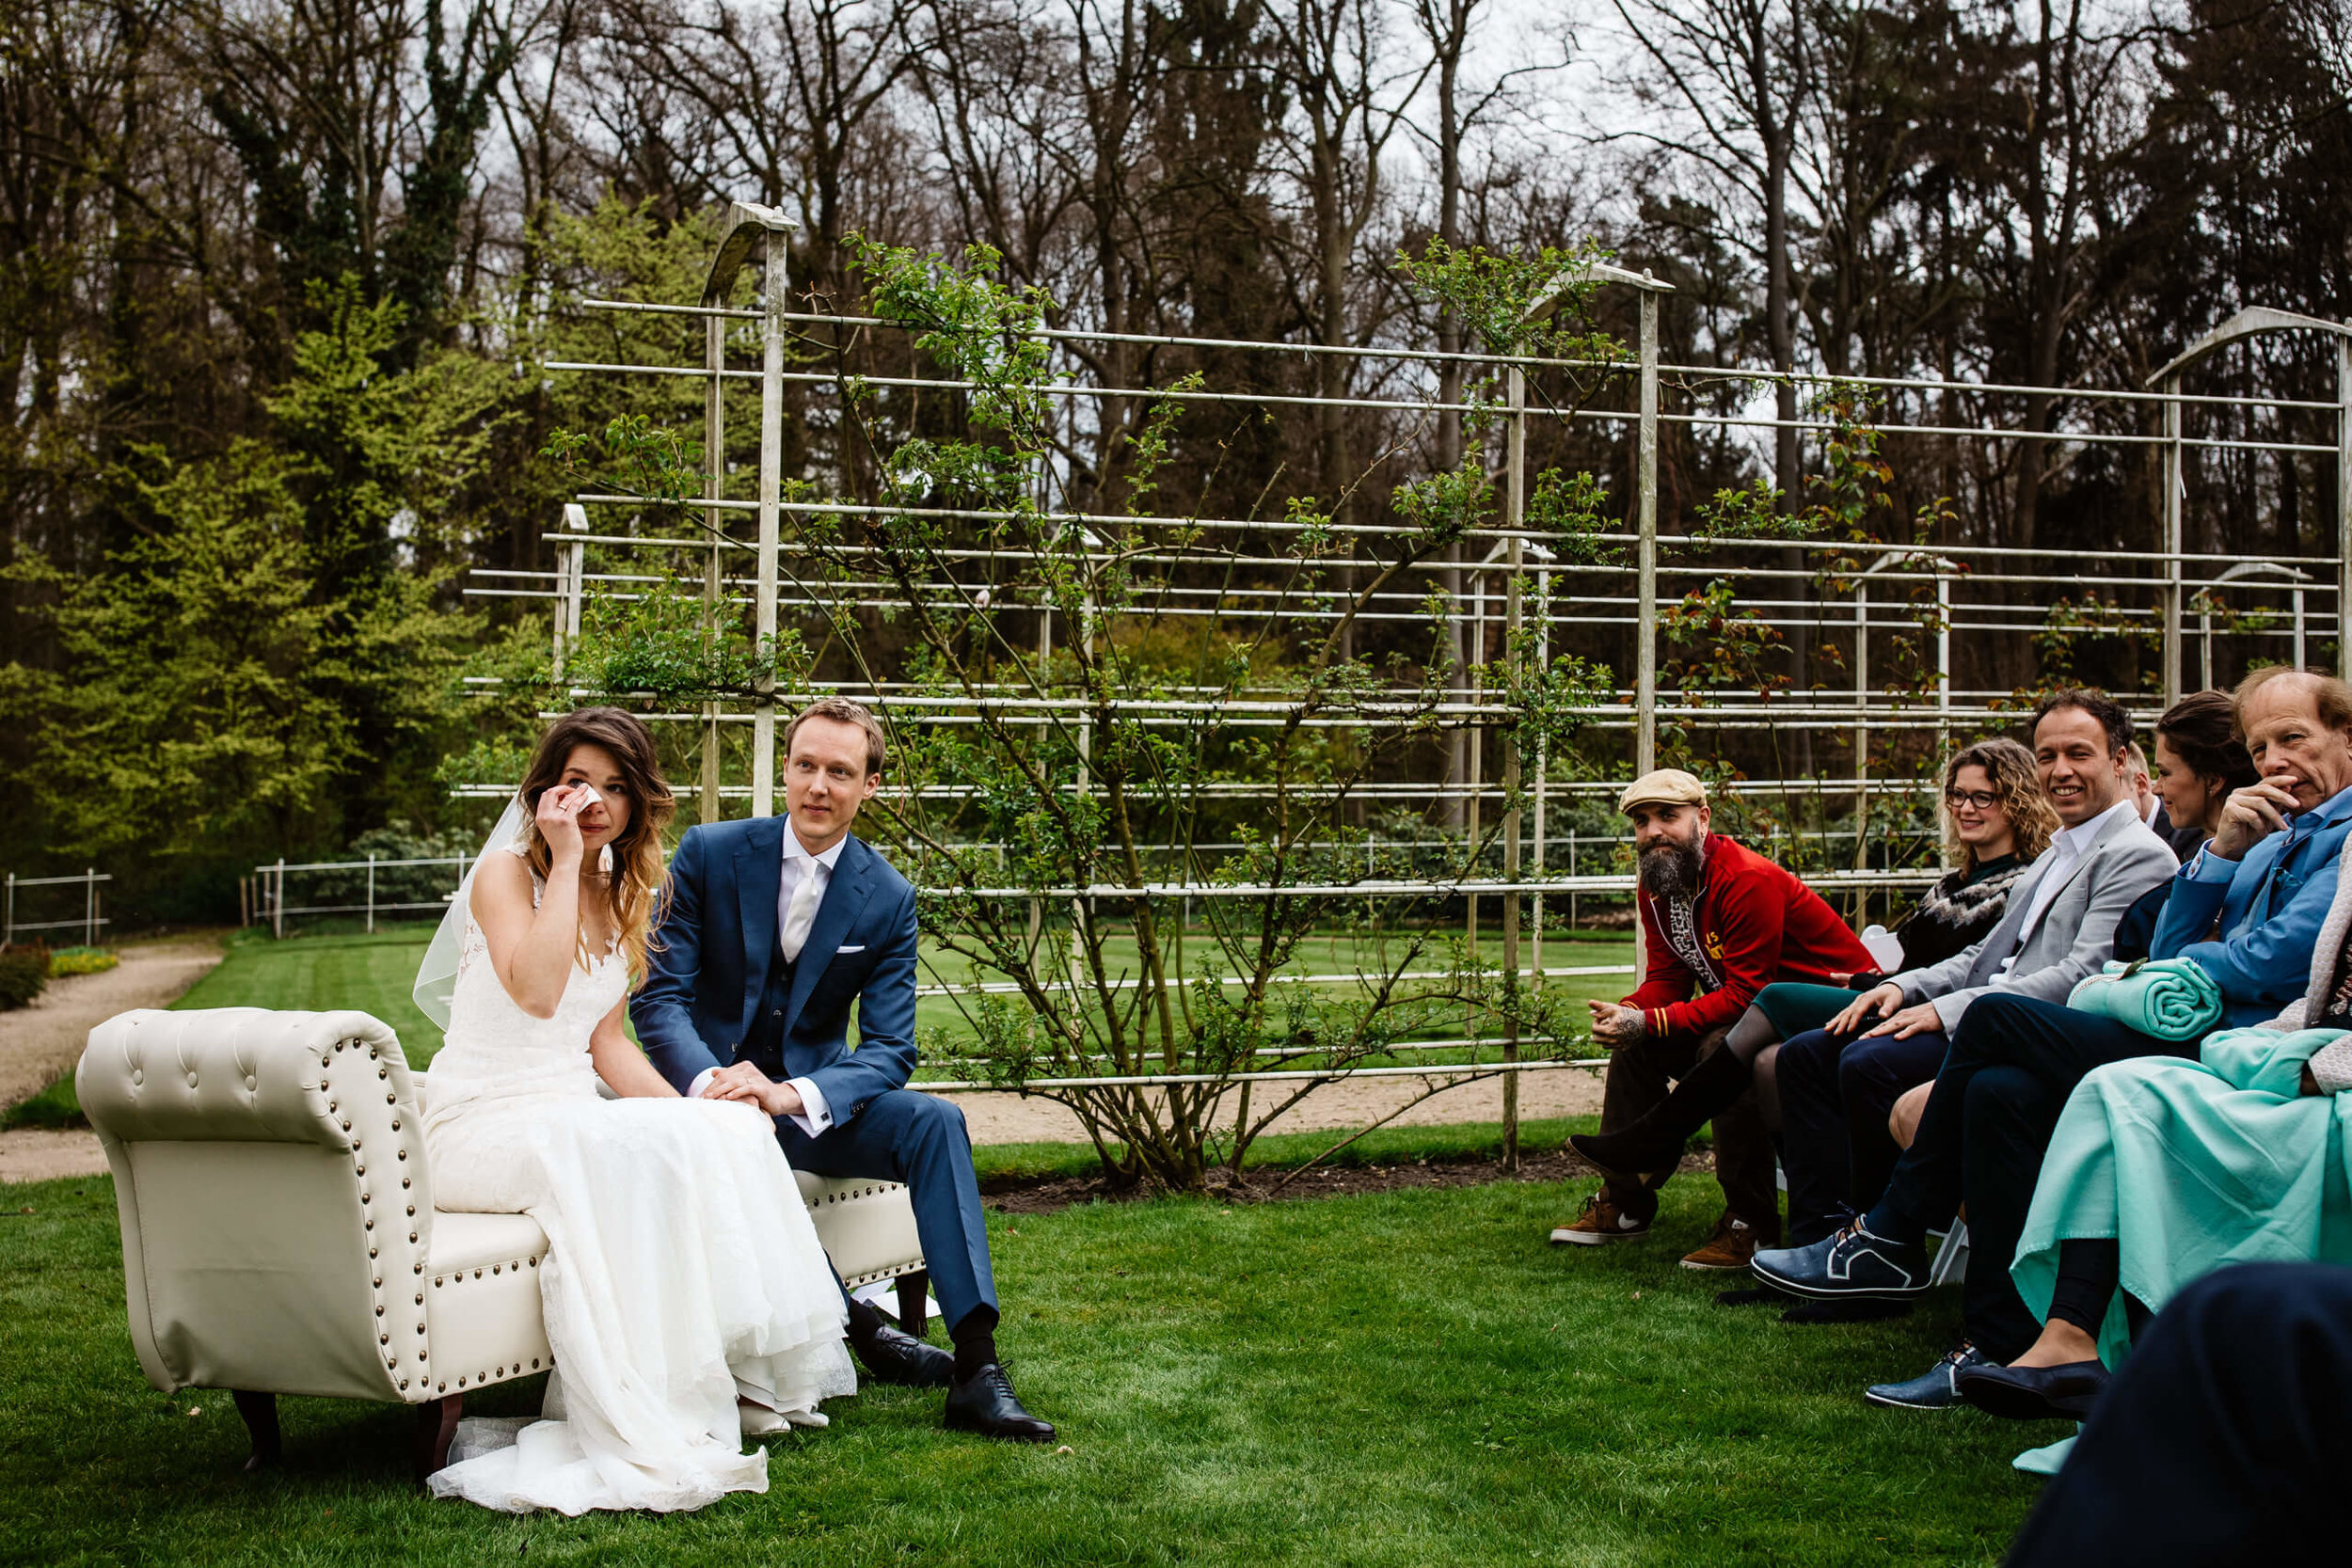 bruidsfotograaf-landgoed-groot-warnsborn-17.jpg